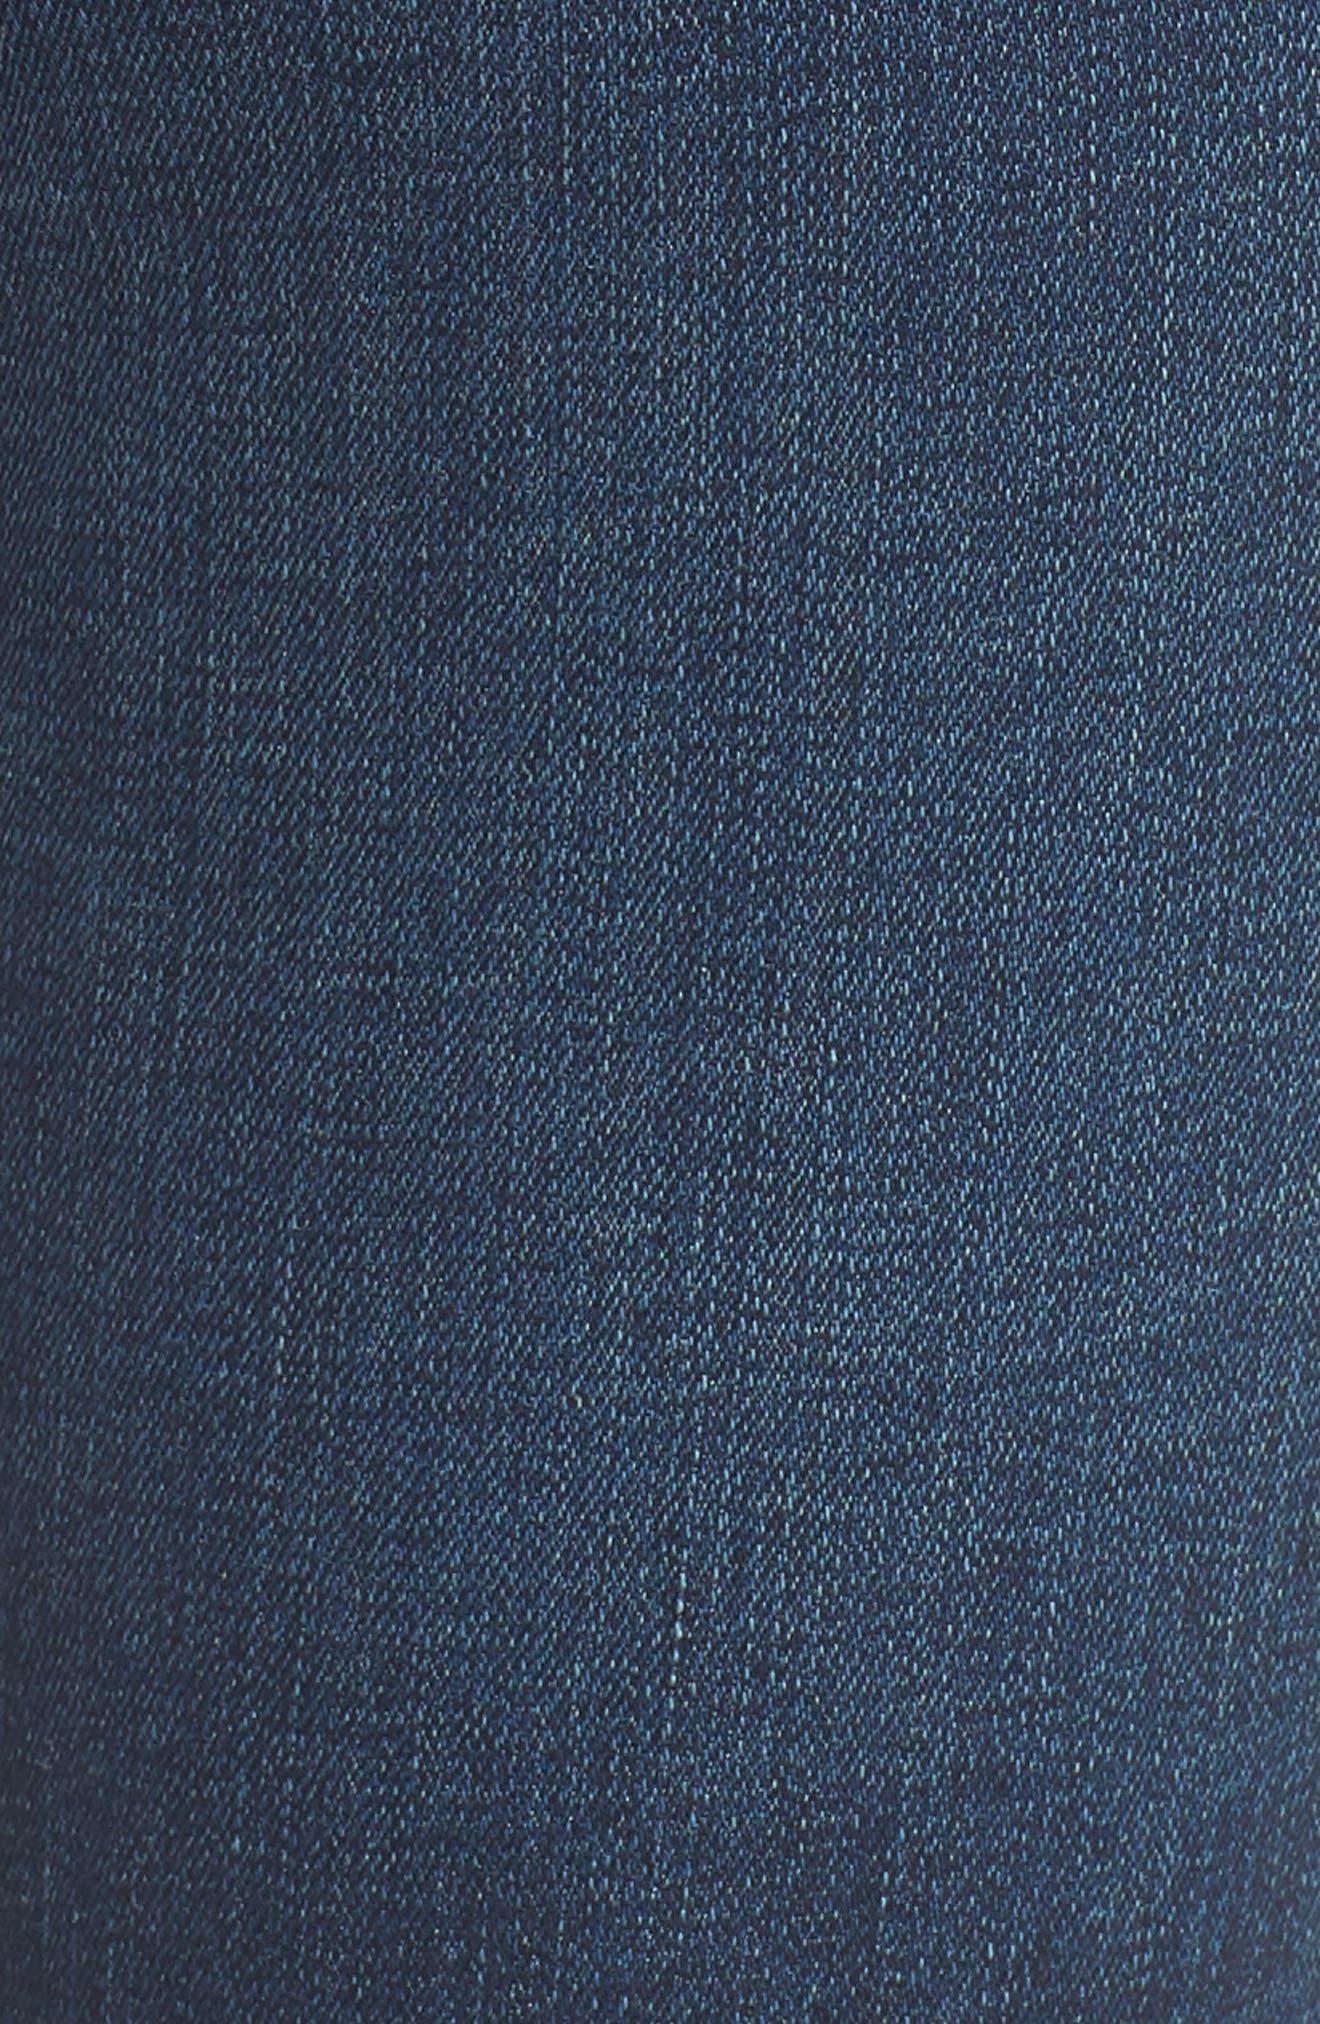 Maria High Waist Skinny Jeans,                             Alternate thumbnail 6, color,                             REVIVAL